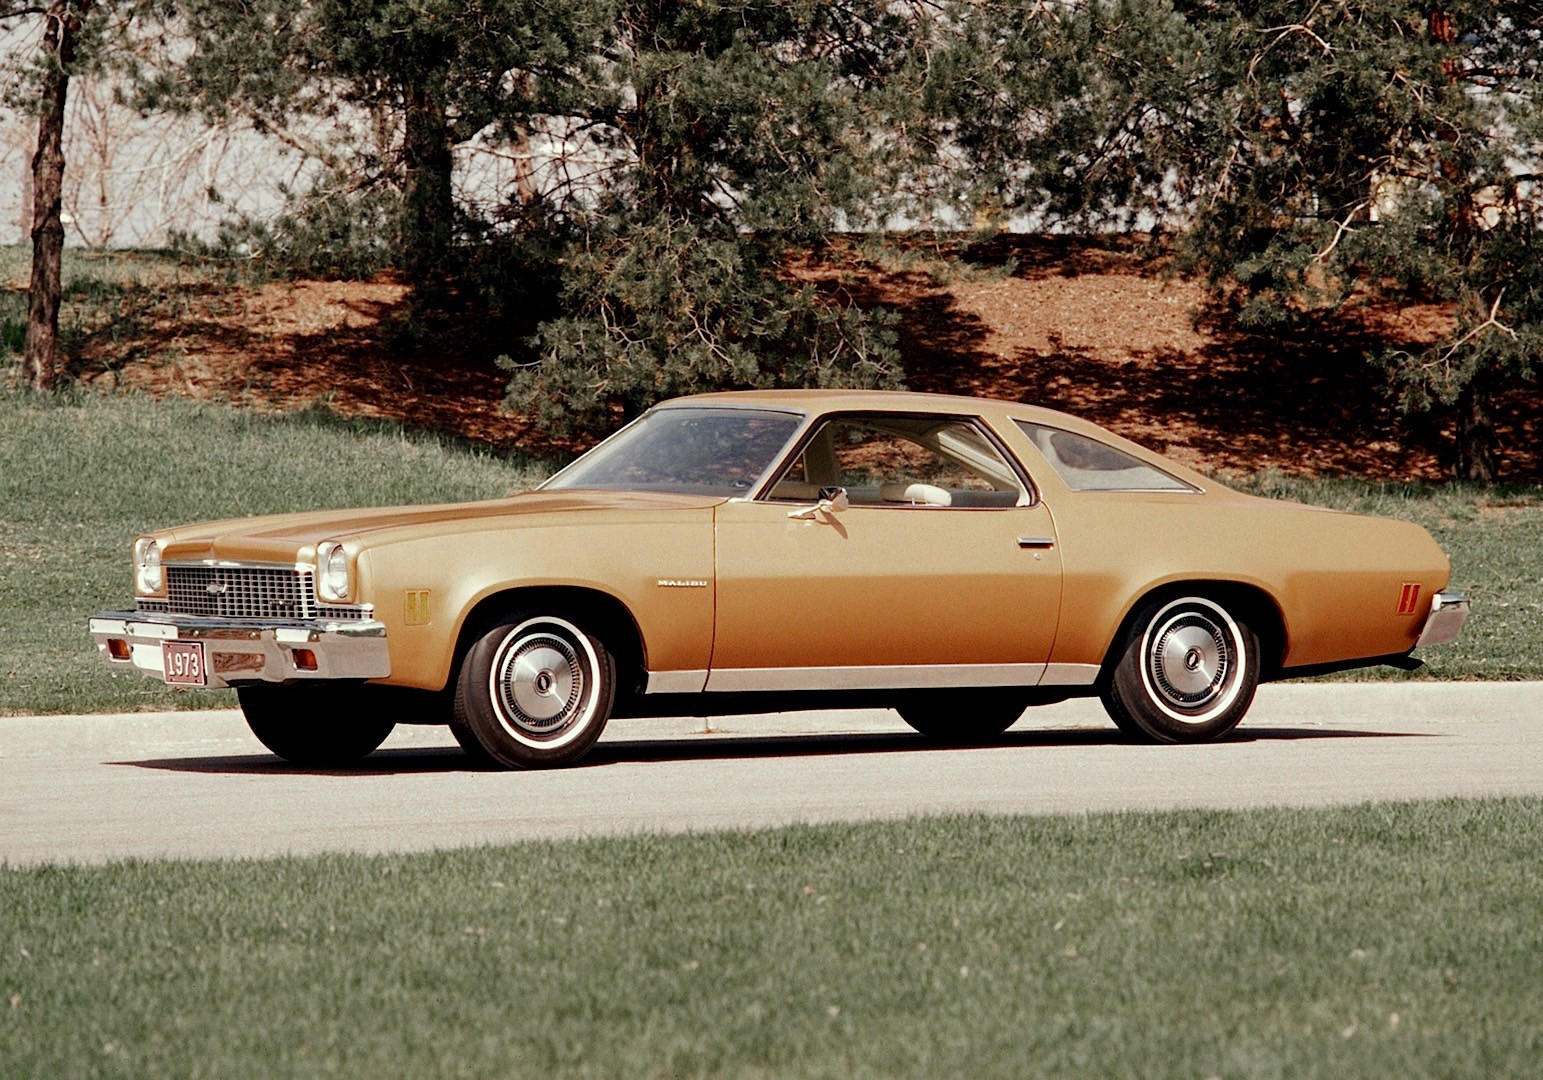 Chevrolet Built 10 Million Malibu Models Over 51 Years